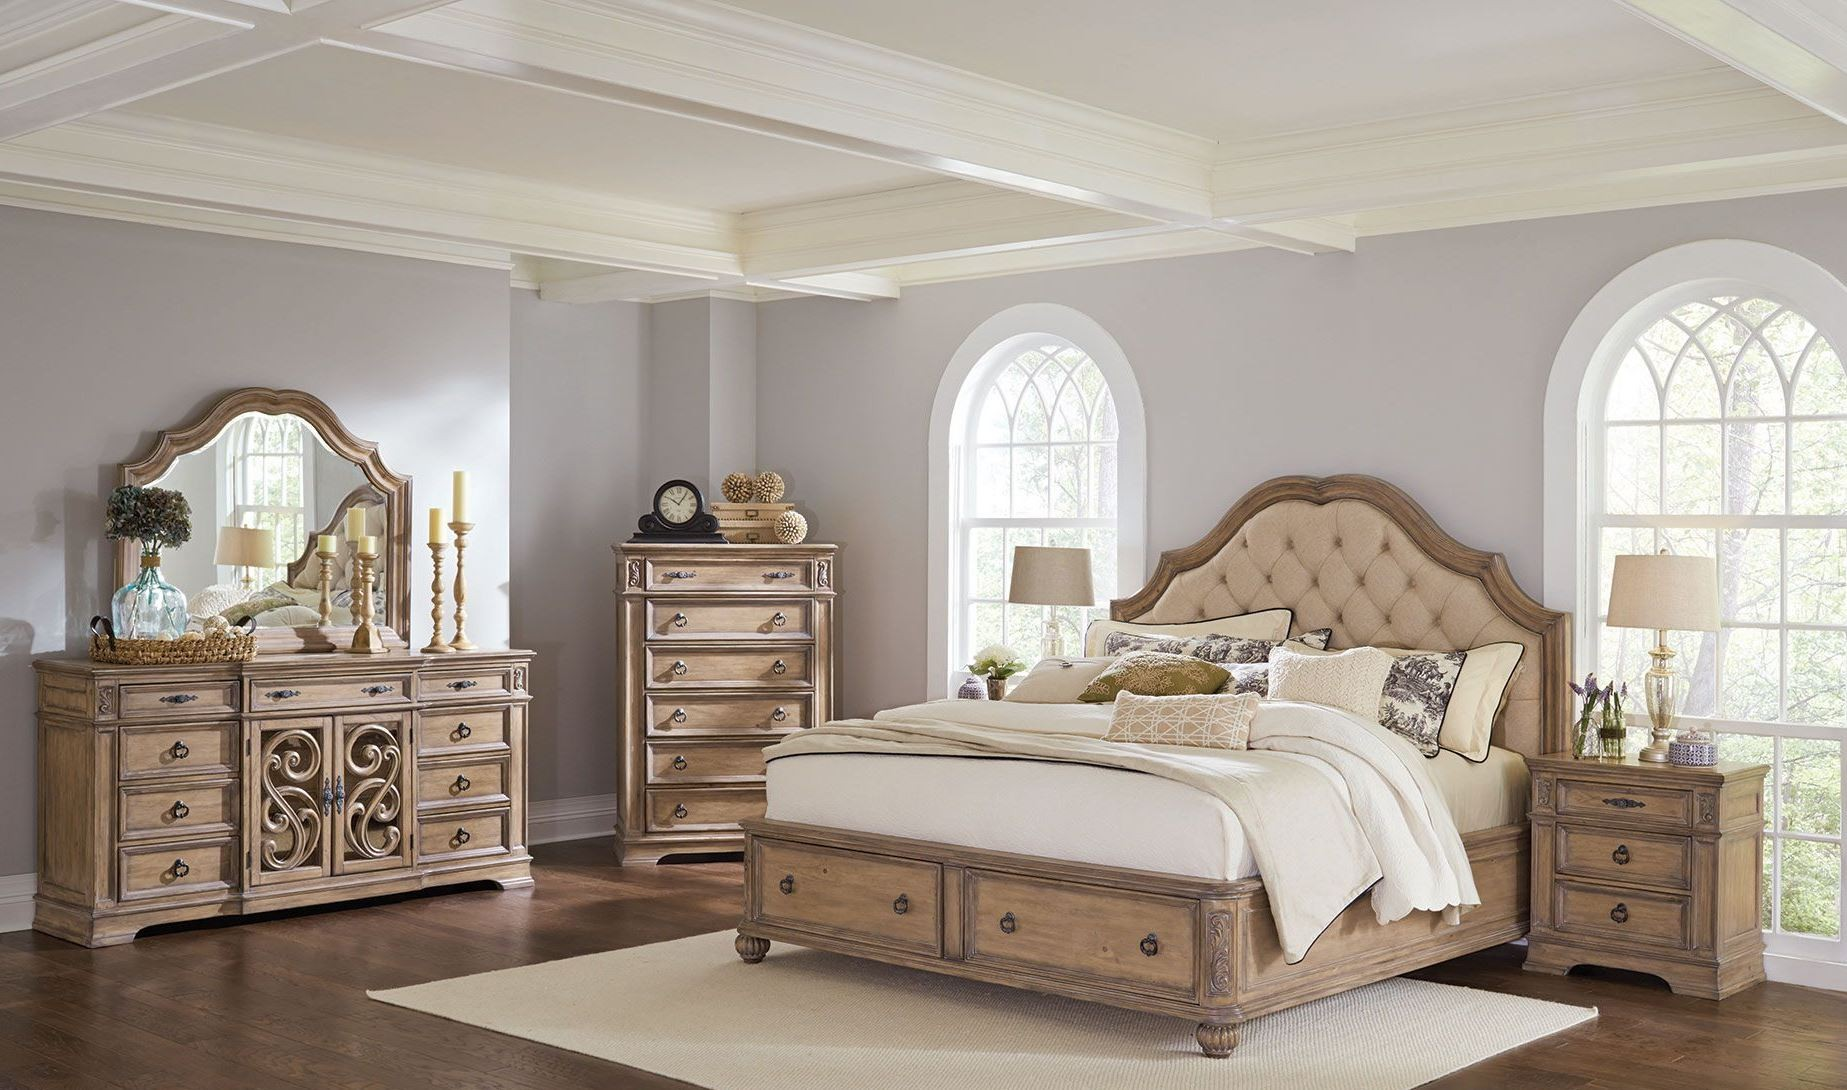 ilana antique linen panel storage bedroom set 205070q coaster furniture. Black Bedroom Furniture Sets. Home Design Ideas